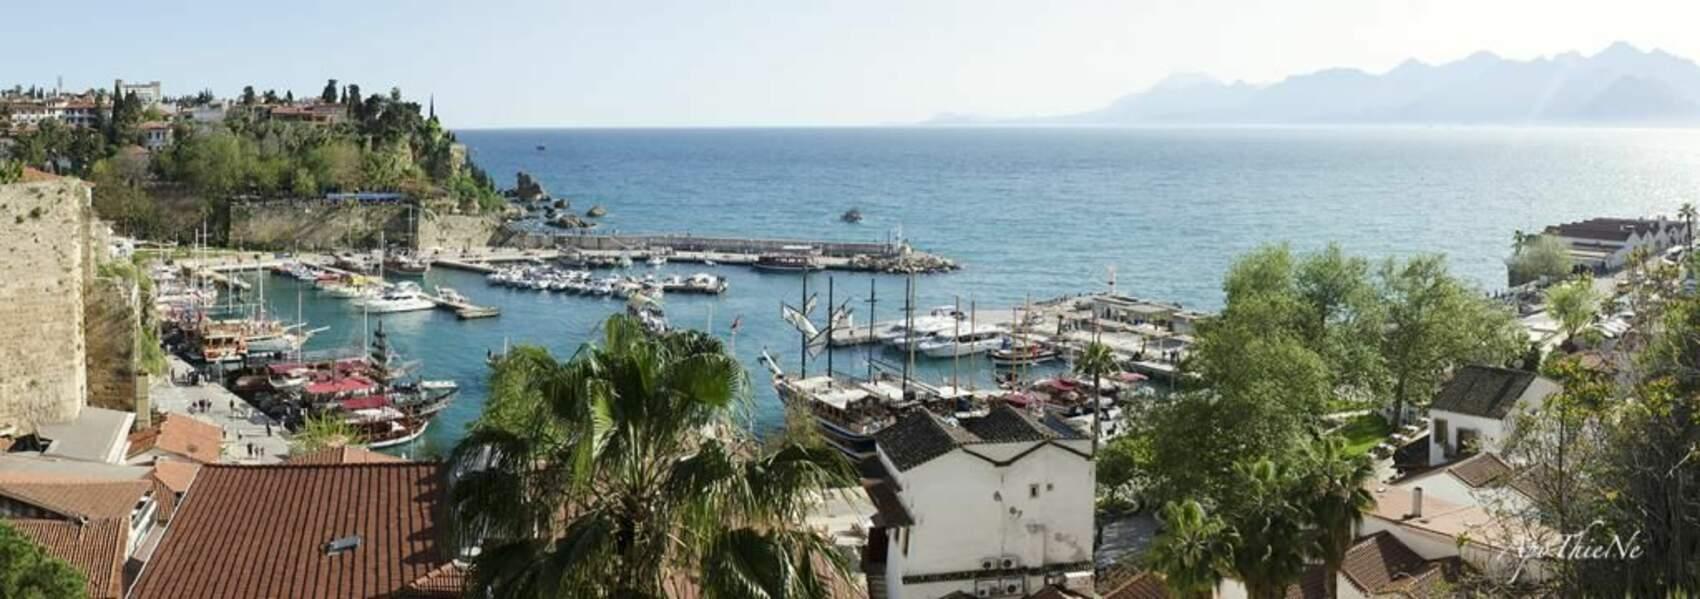 Port d'Antalya en Turquie, par ApoThieNe